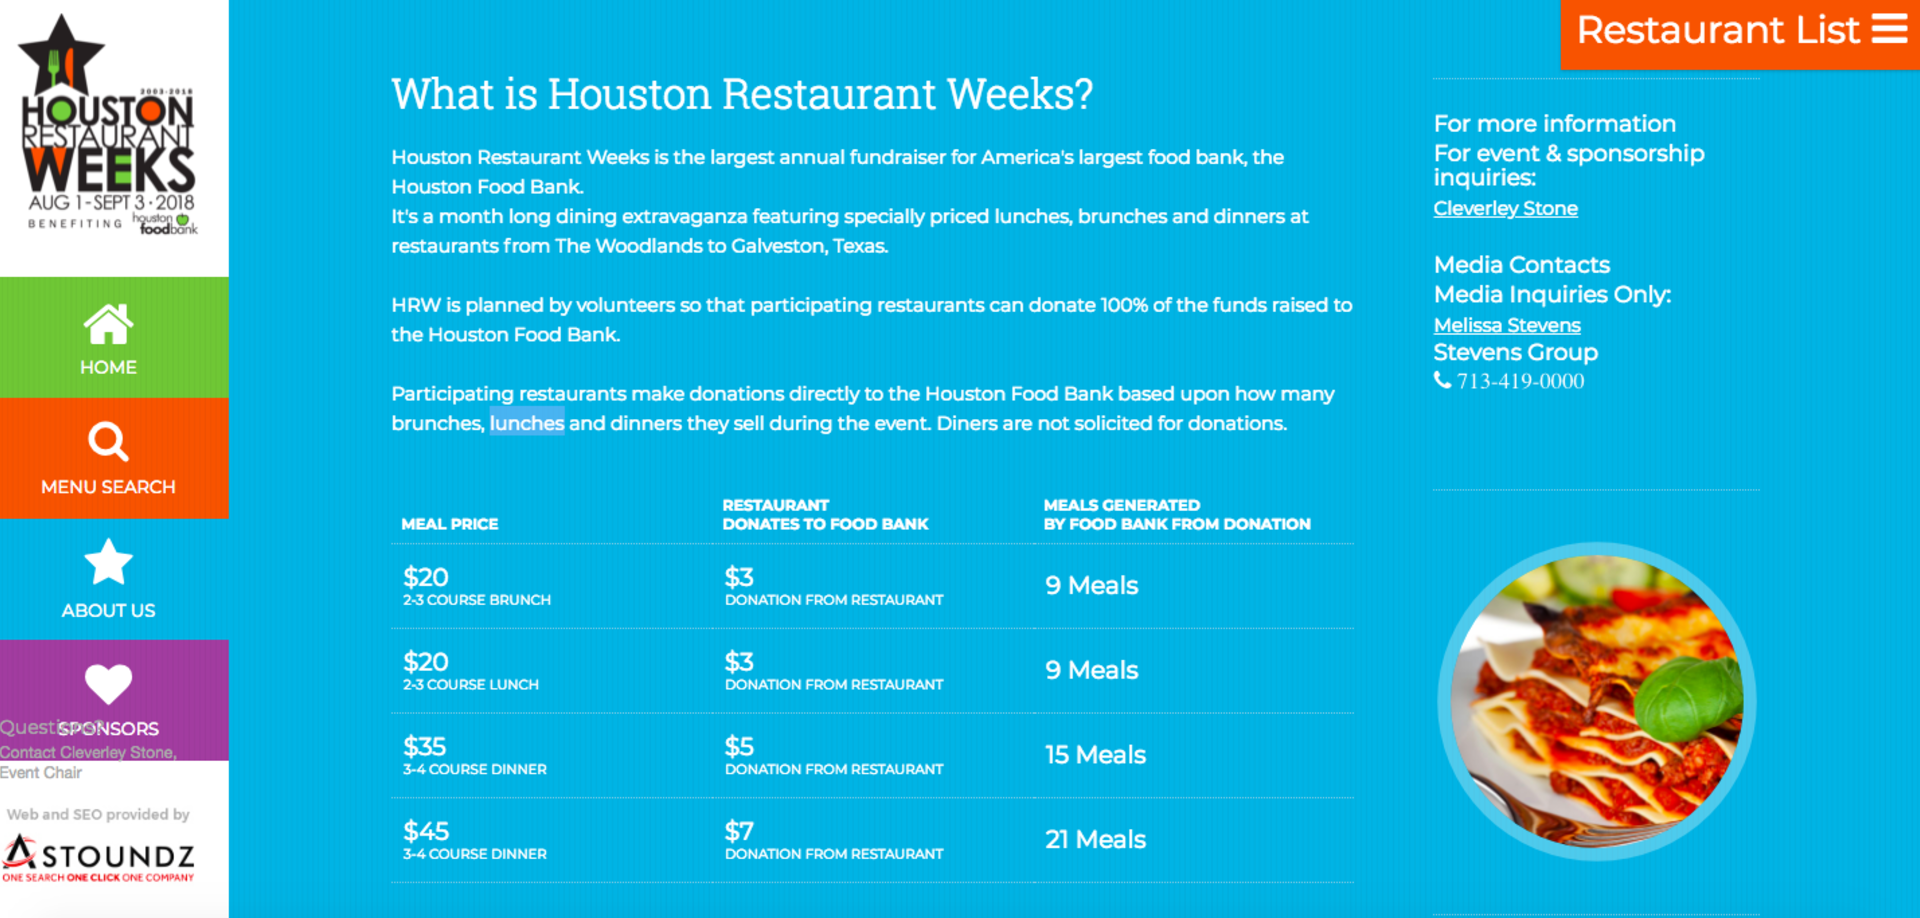 #MondayMinute: Houston Restaurant Weeks